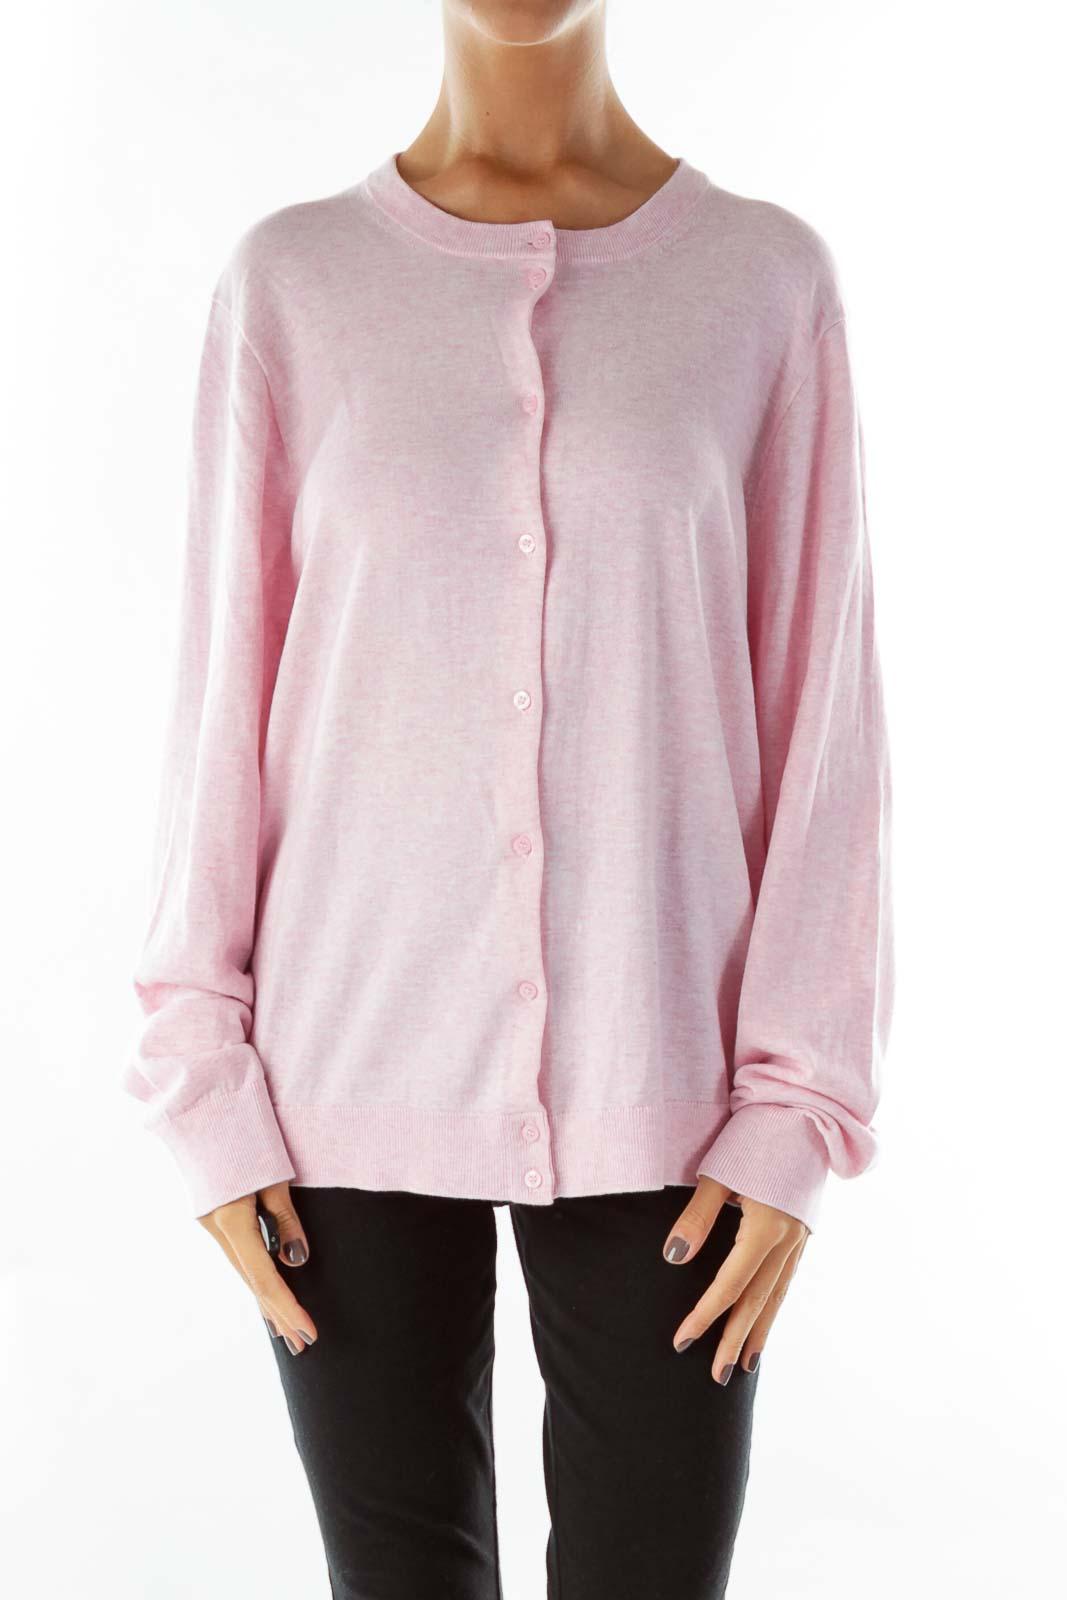 Baby Pink Round-Neck Cardigan